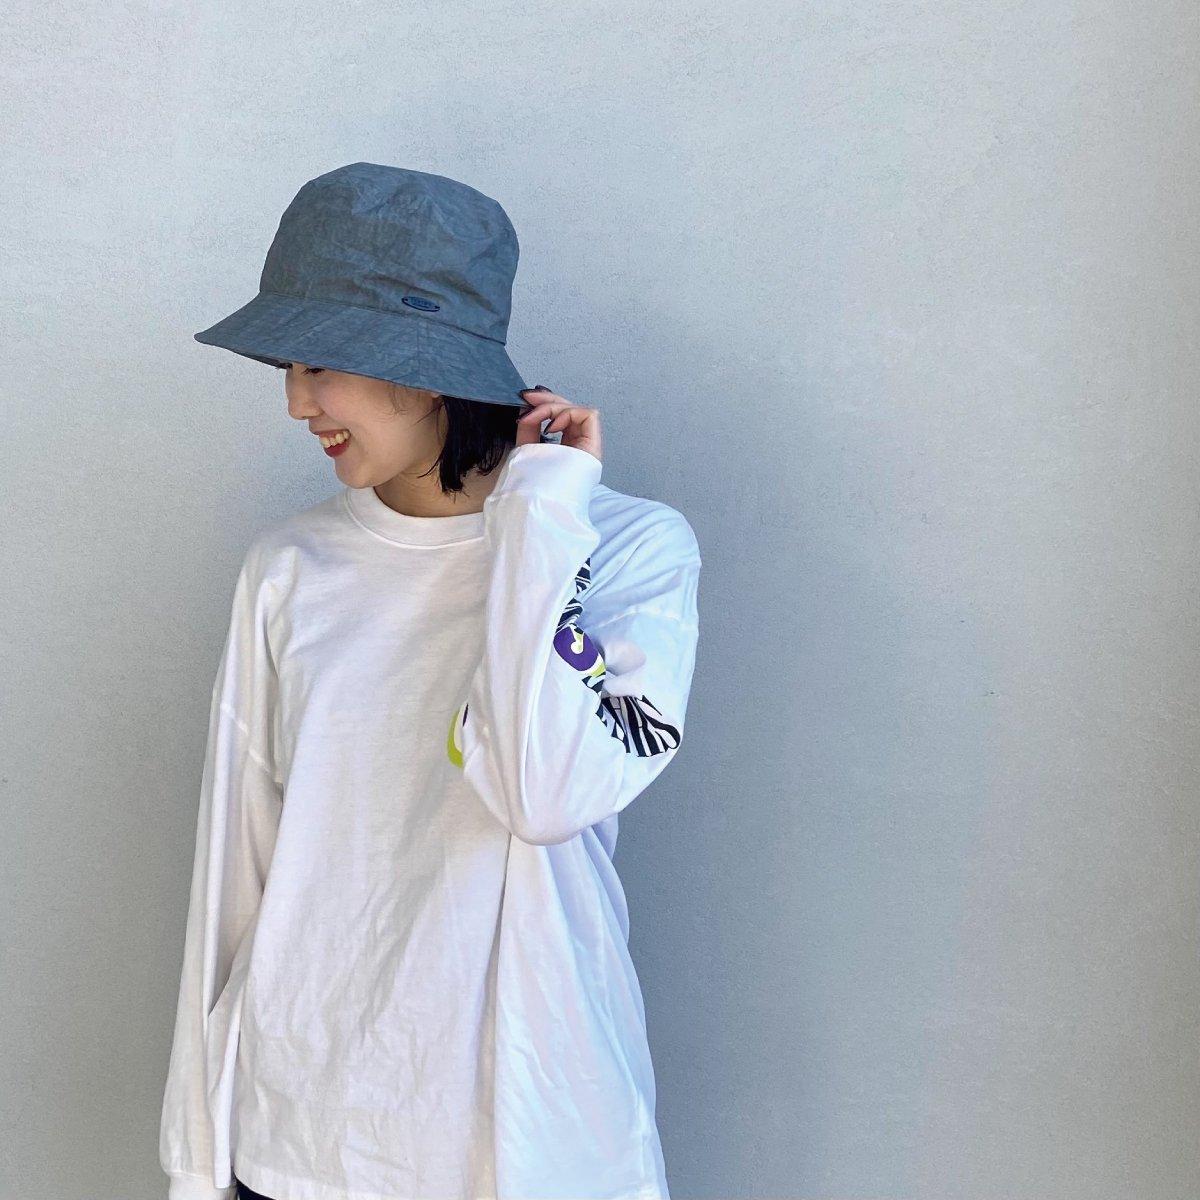 Dyeing Hat 詳細画像26